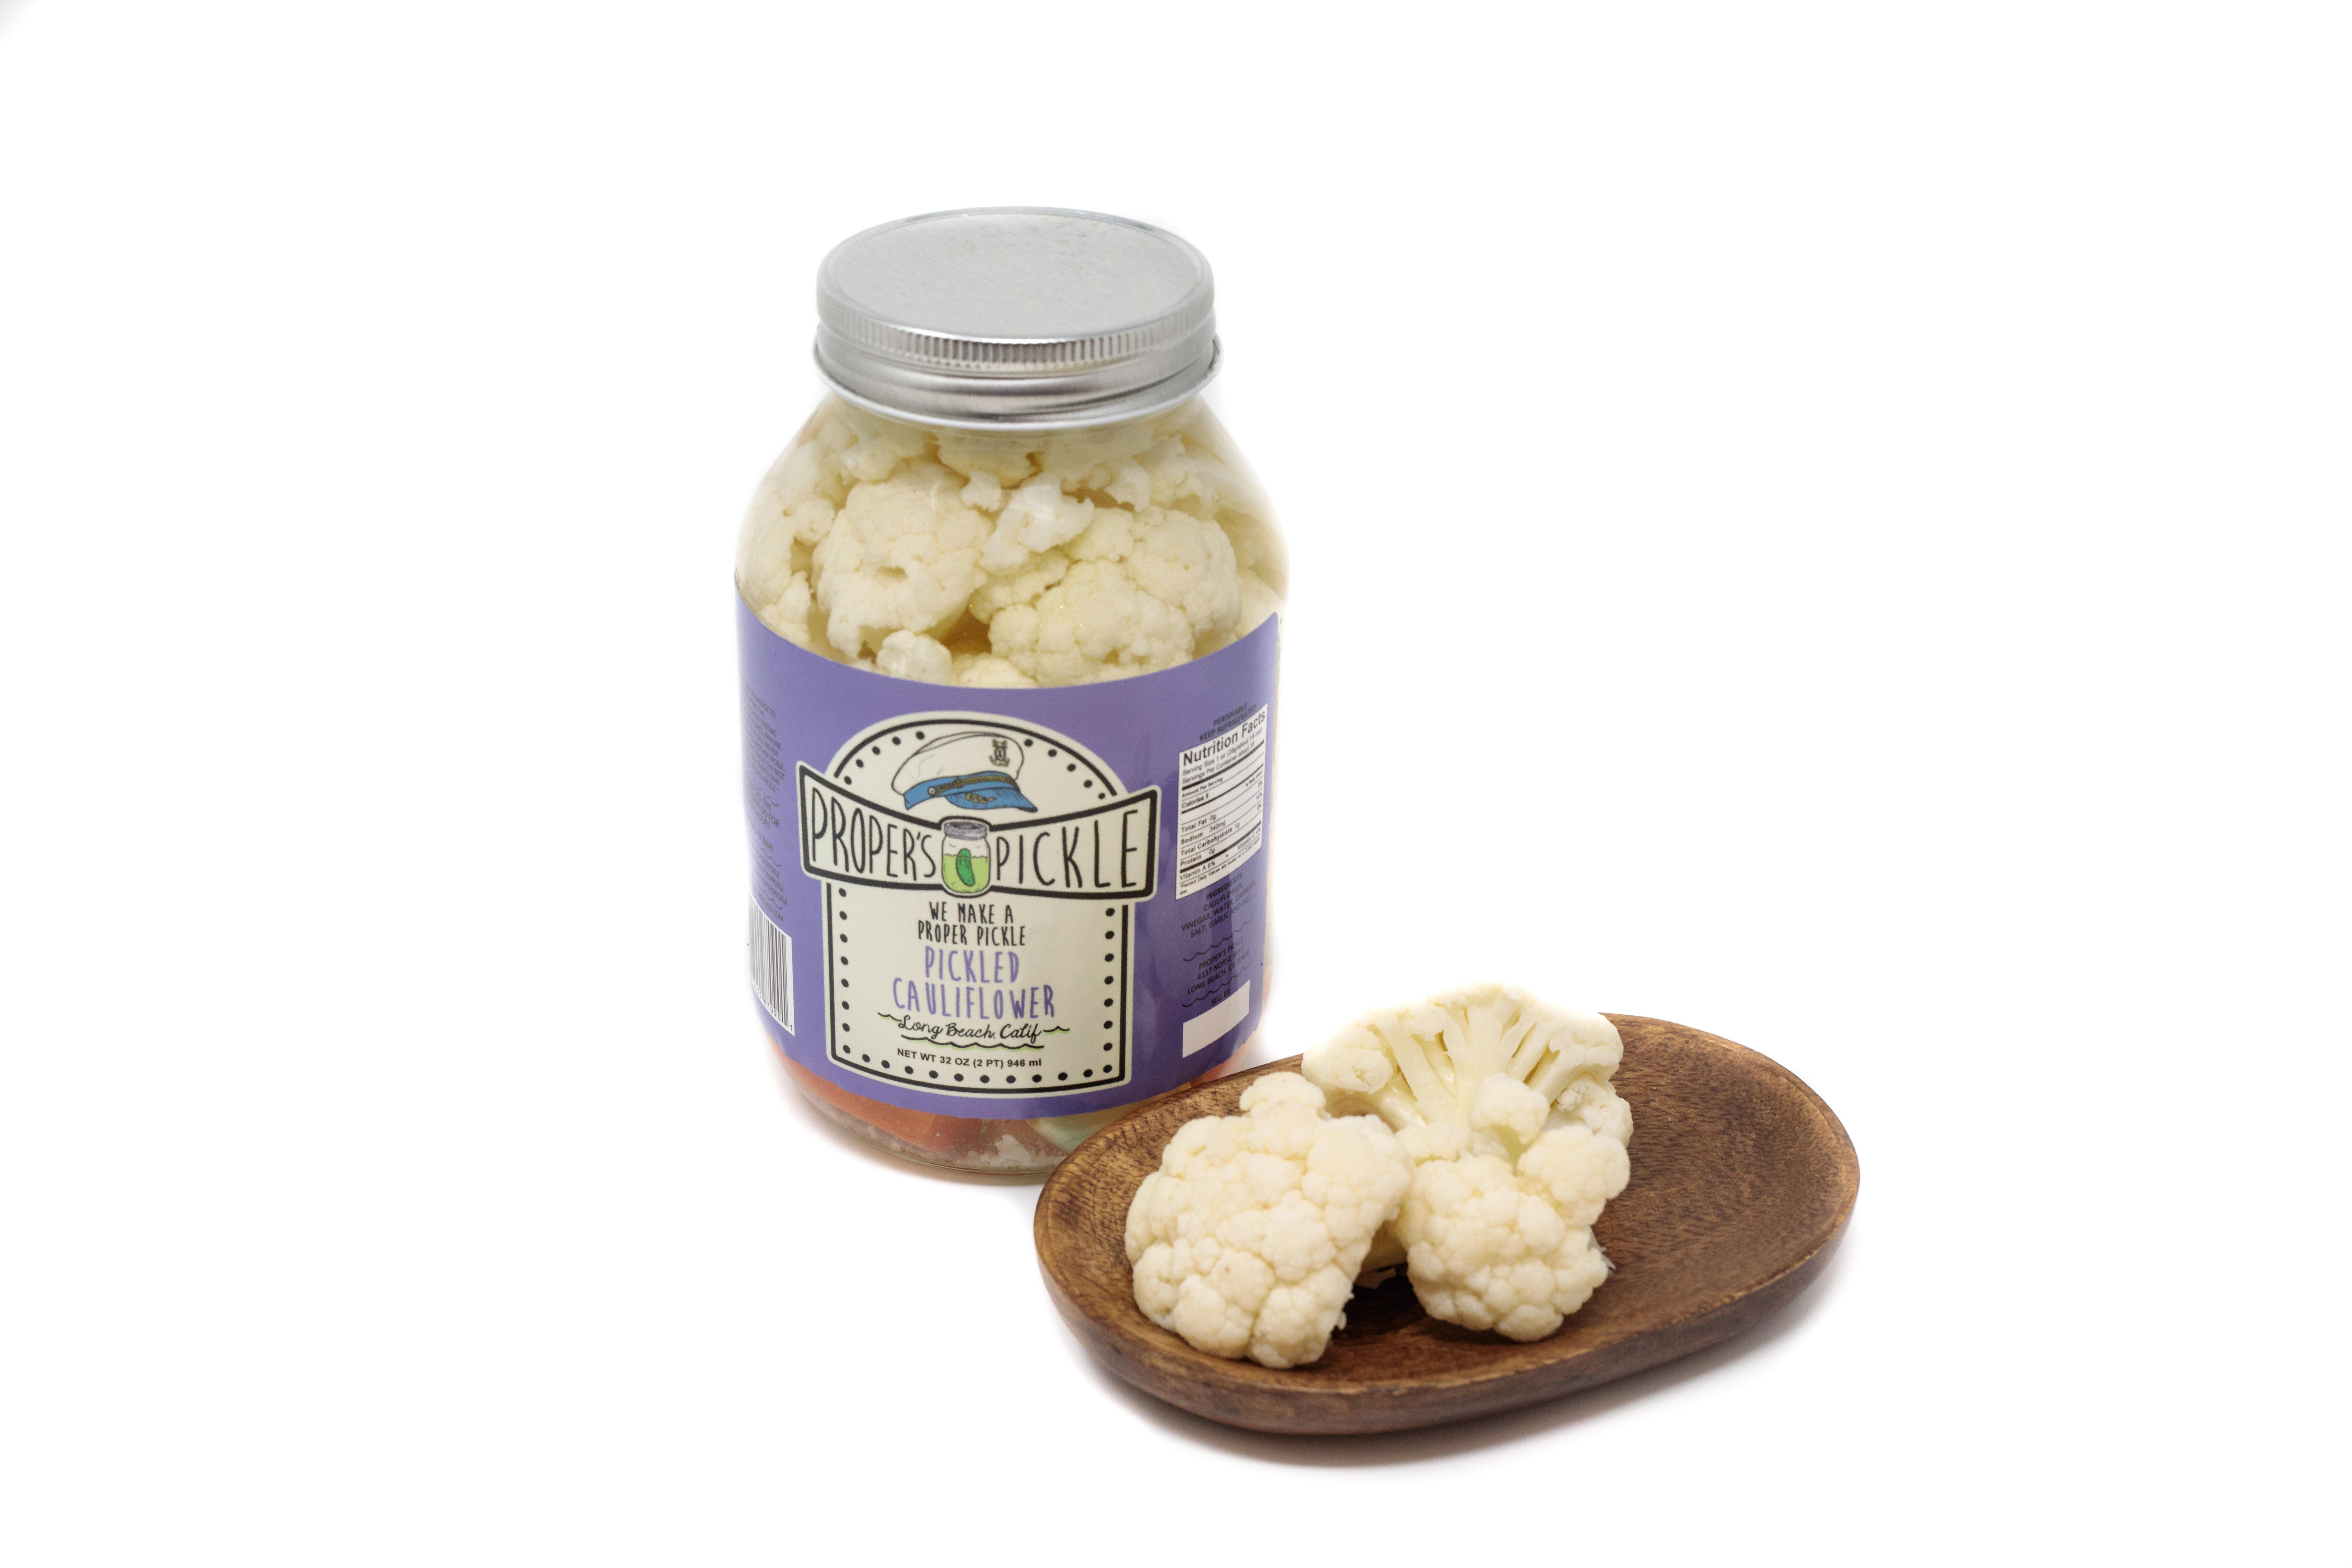 Proper's Pickled Cauliflower 32 oz